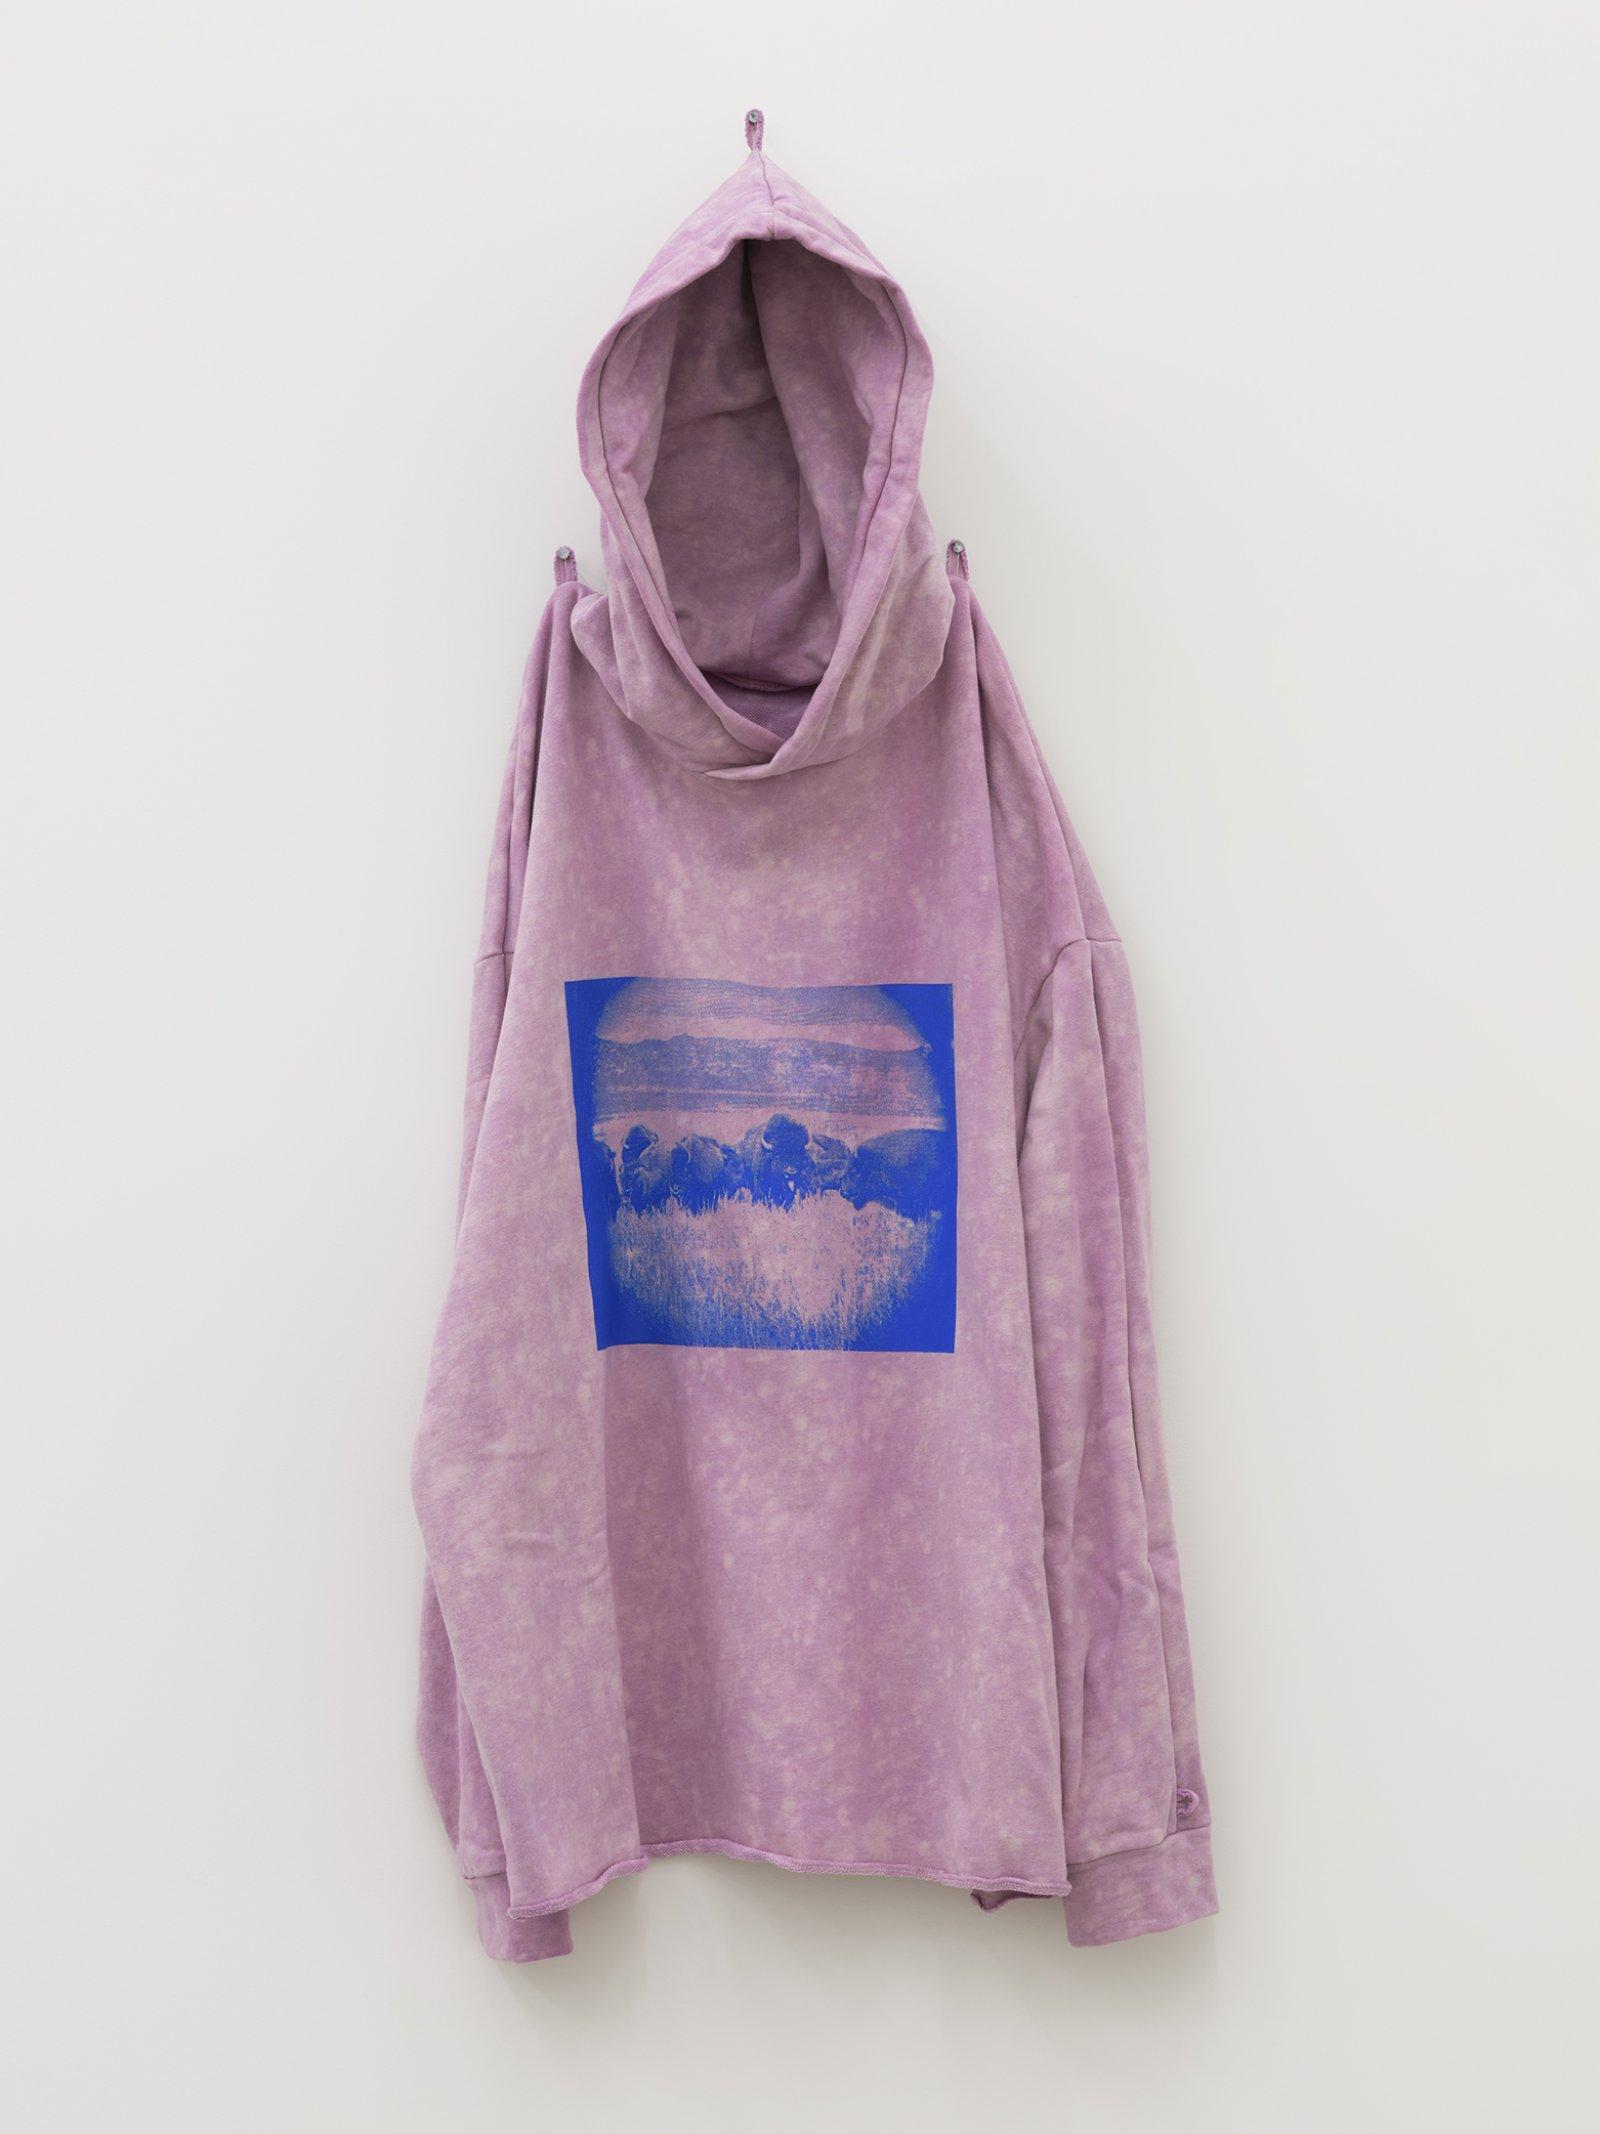 Duane Linklater, silentstar, delicacy, 2020, handmade hoodie, cochineal dye, silkscreen, nails, 56 x 20 x 5 in. (142 x 51 x 13 cm)